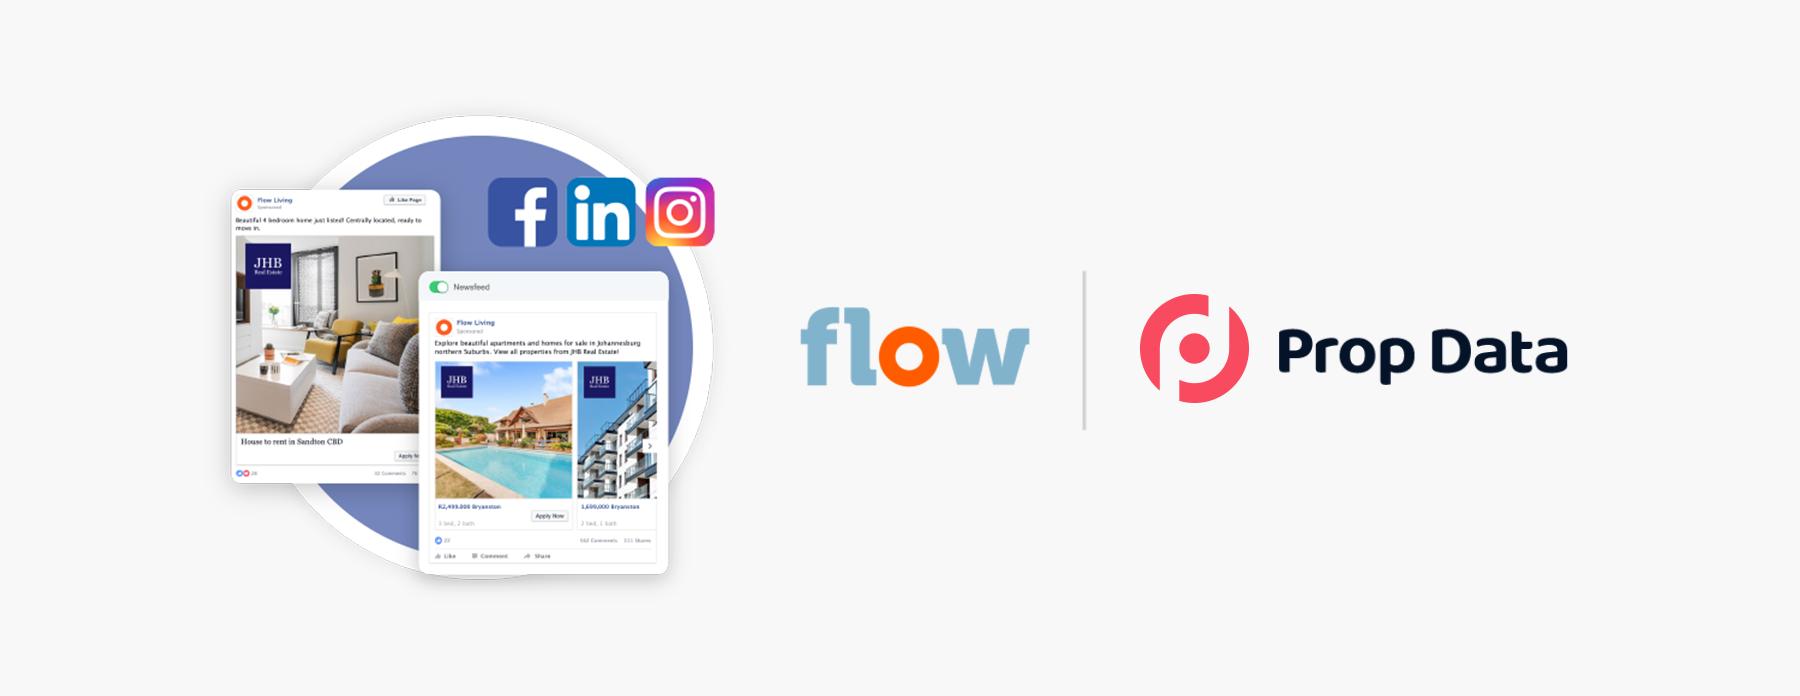 Flow ad & logo3.png